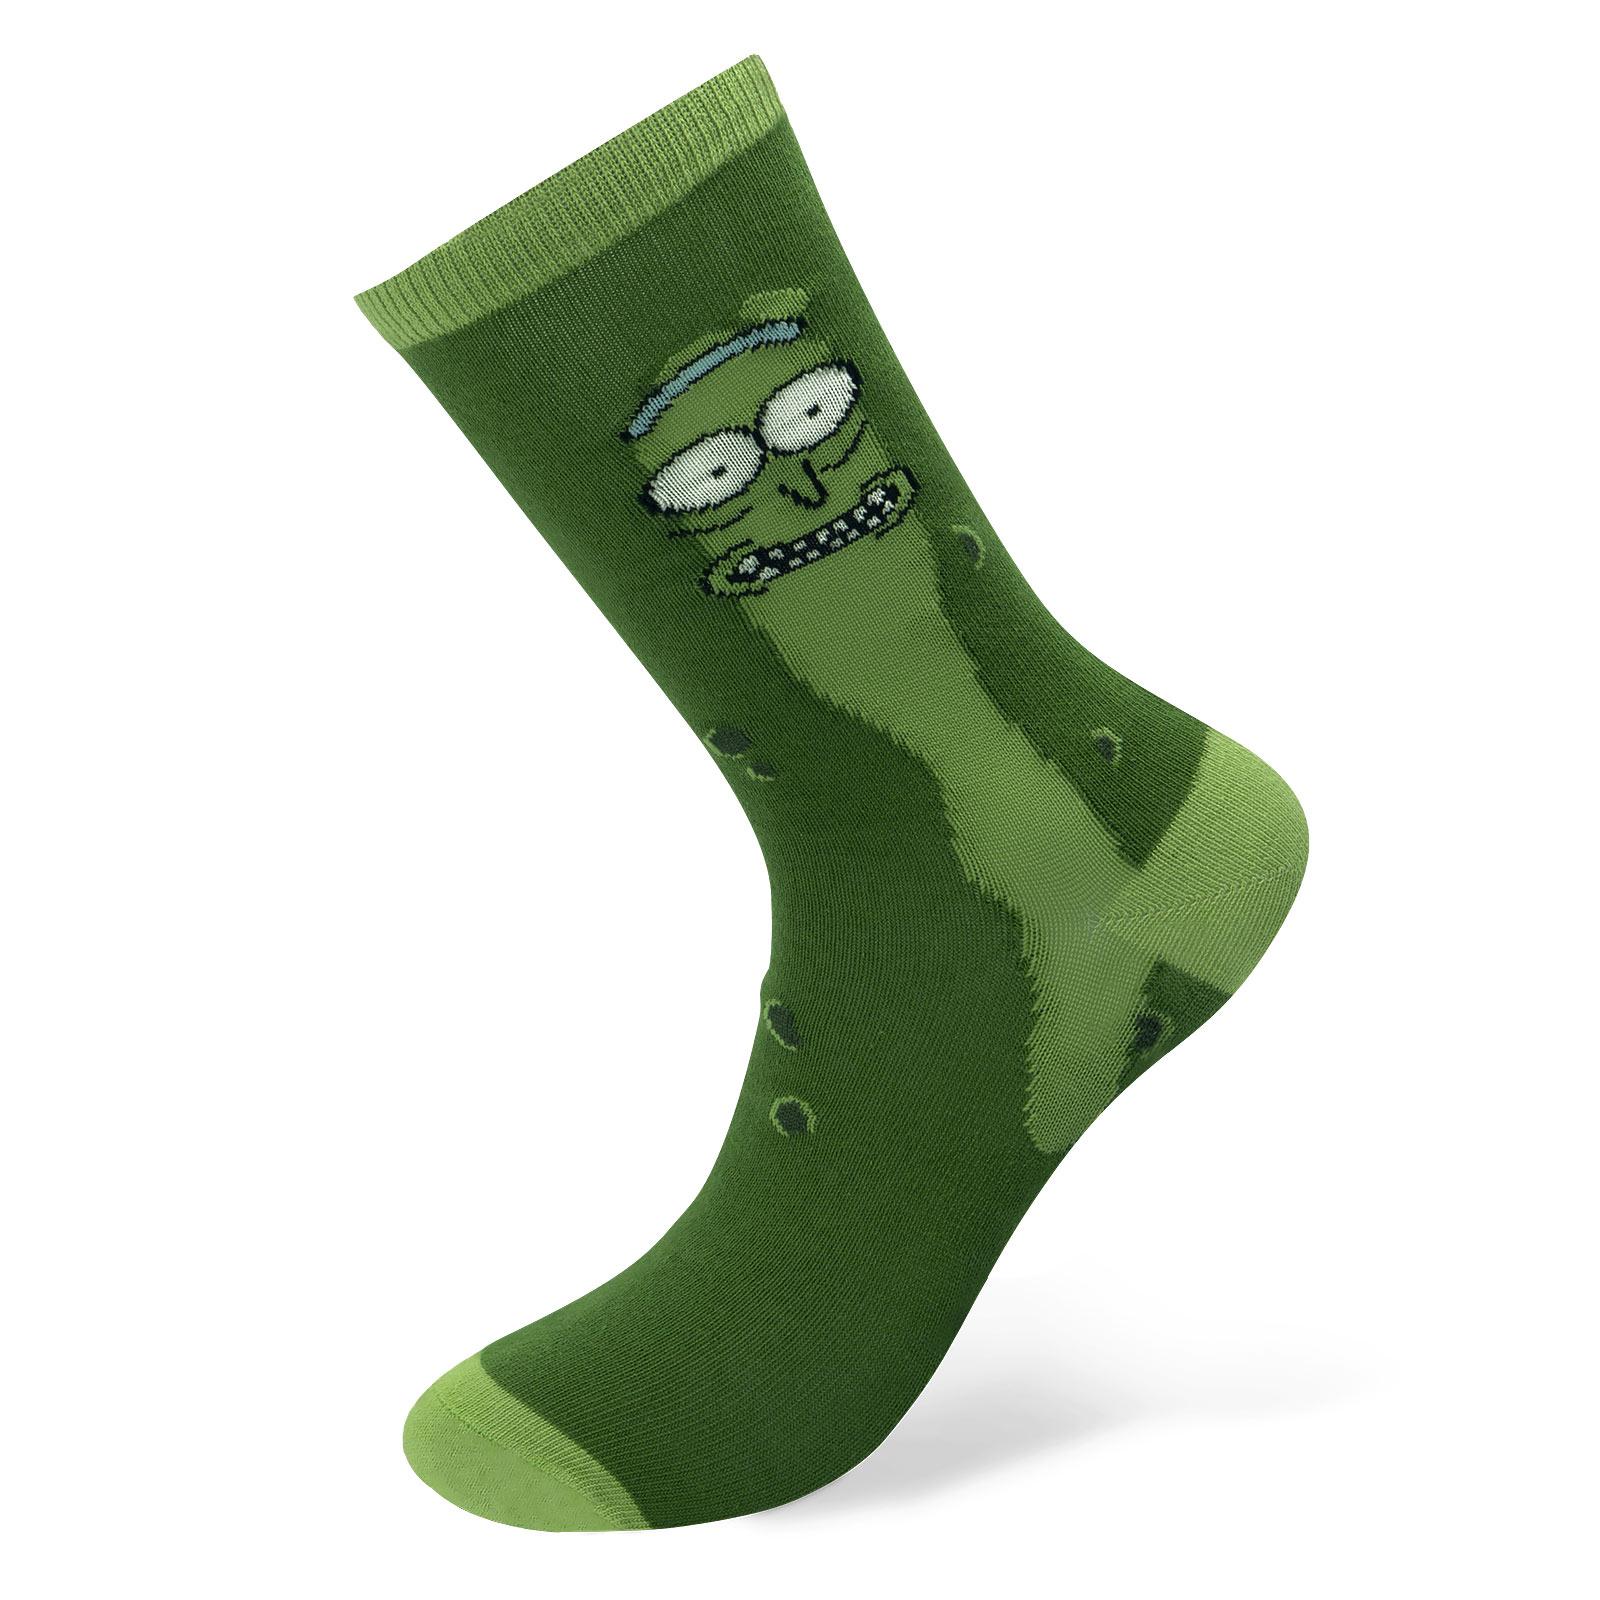 Rick and Morty - Pickle Rick Socken